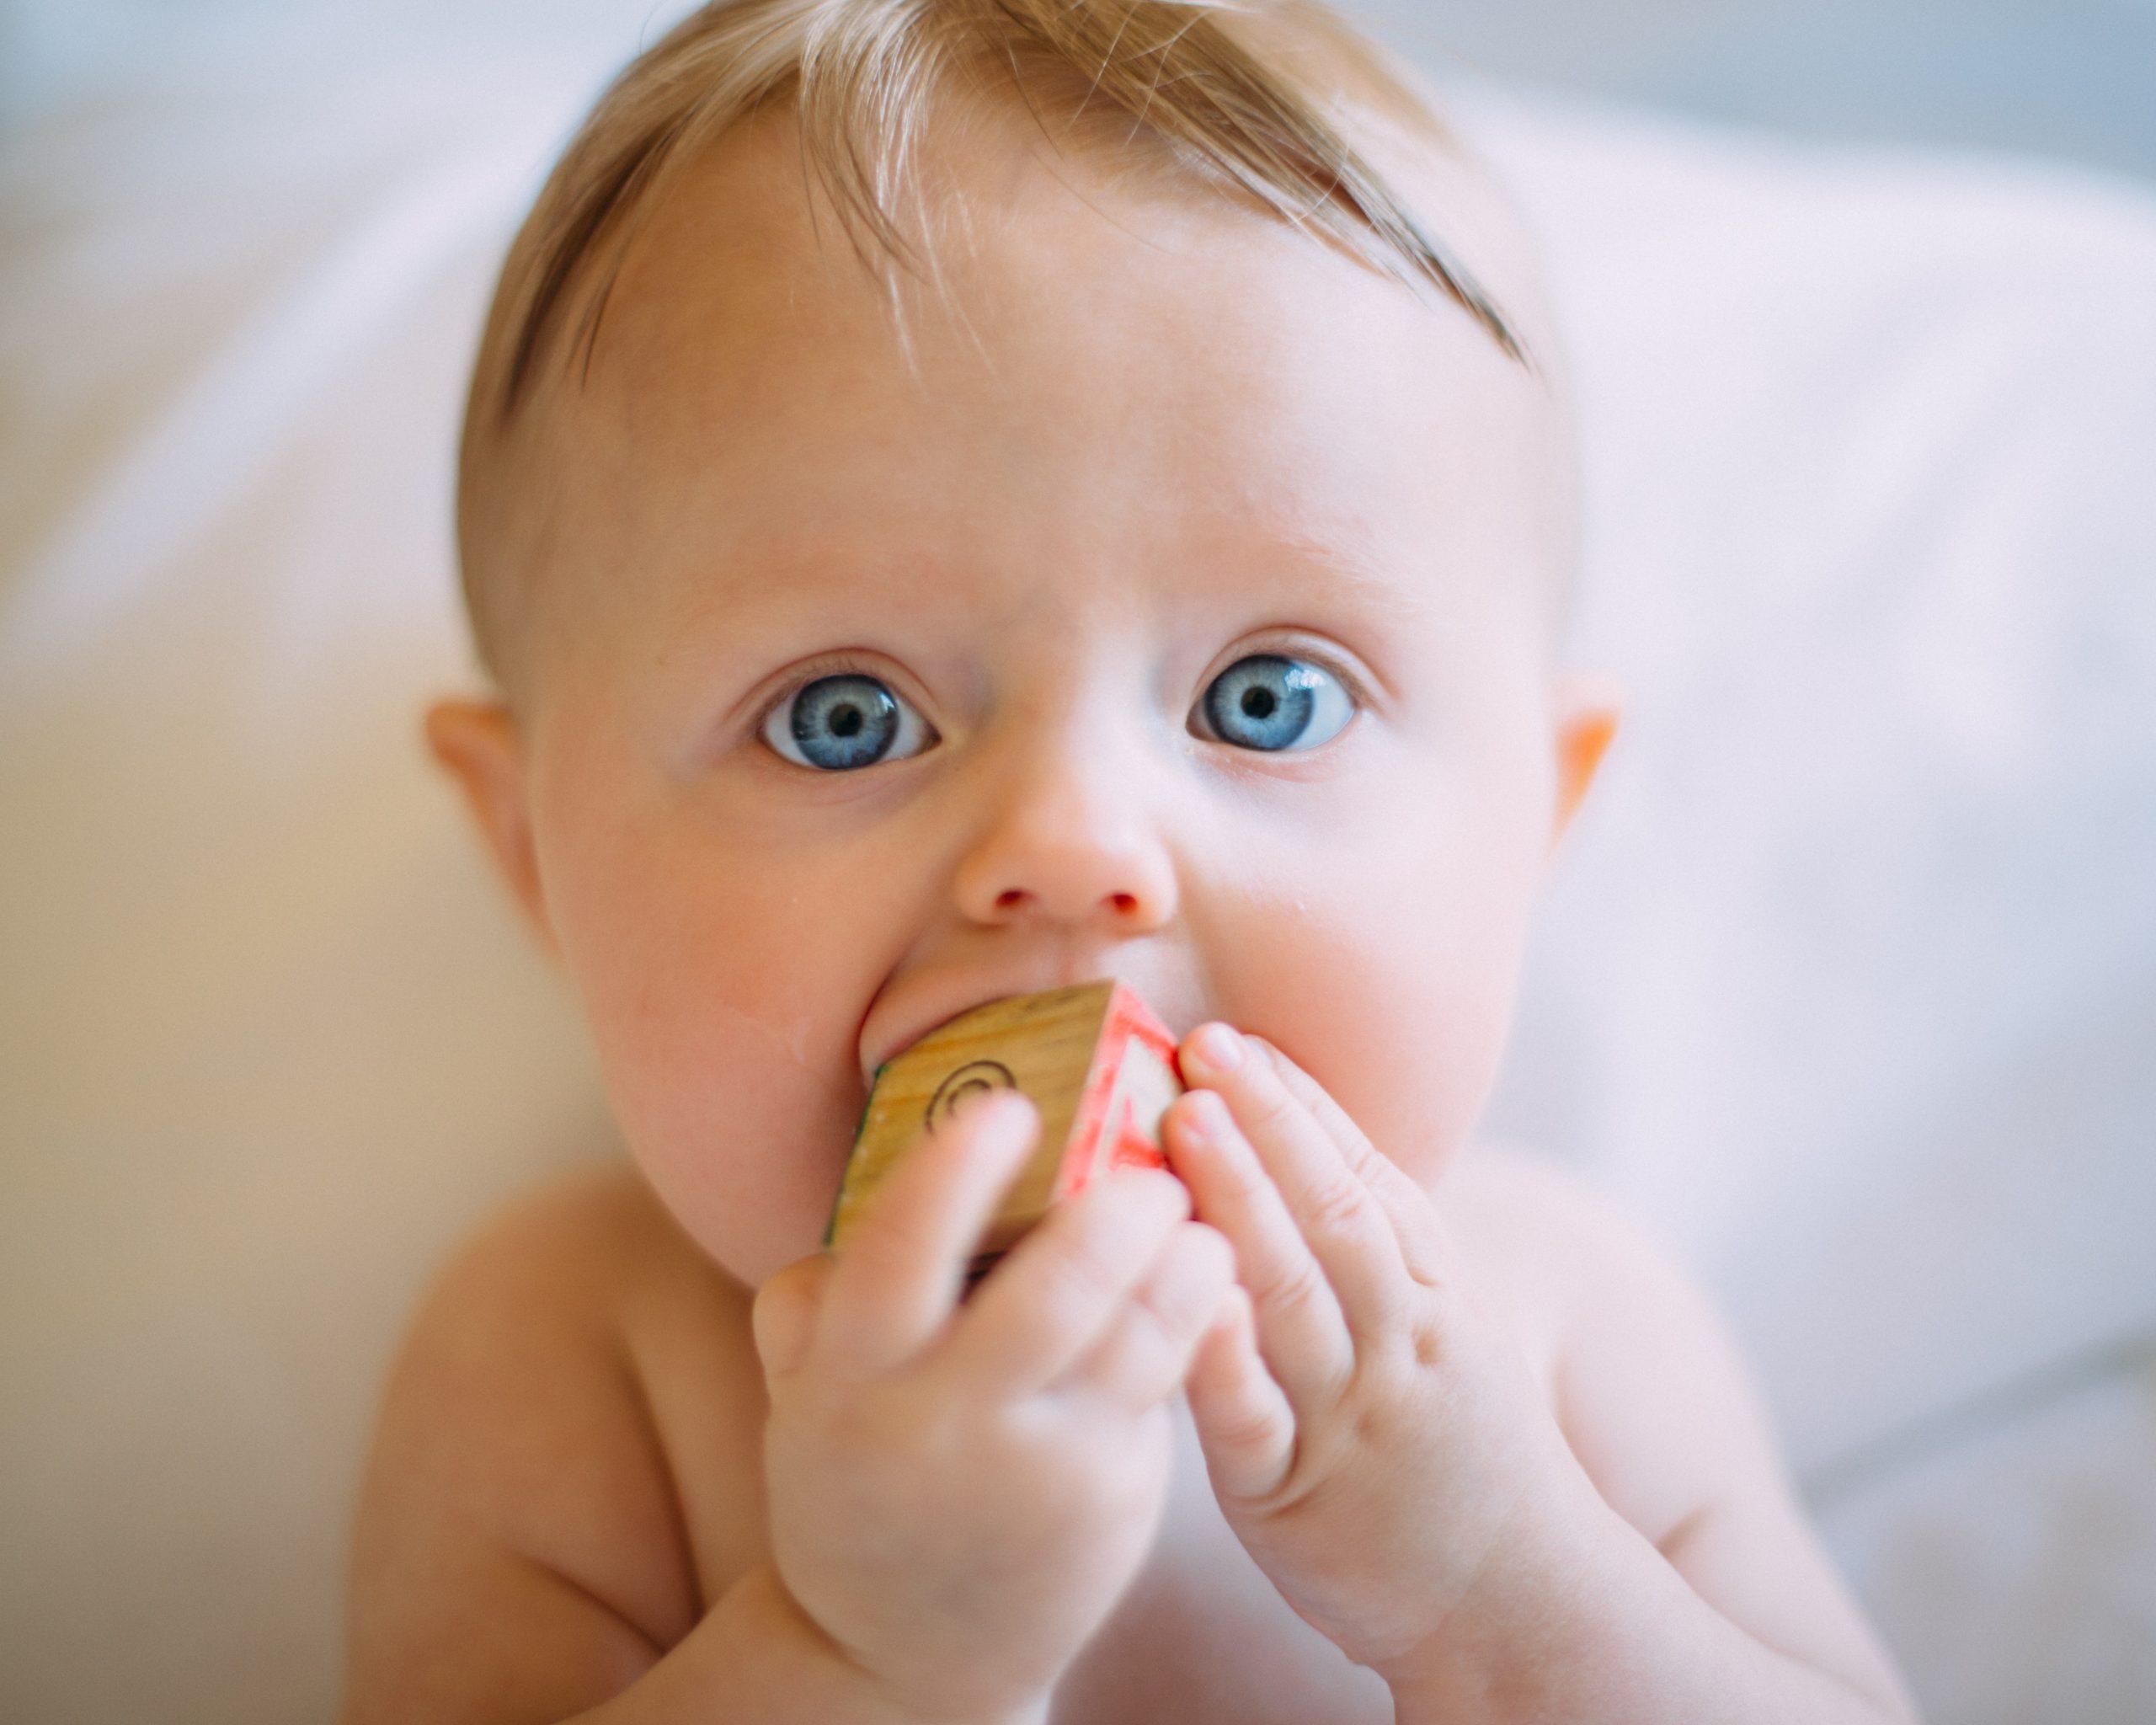 Baby Milestones 7 - 9 Months